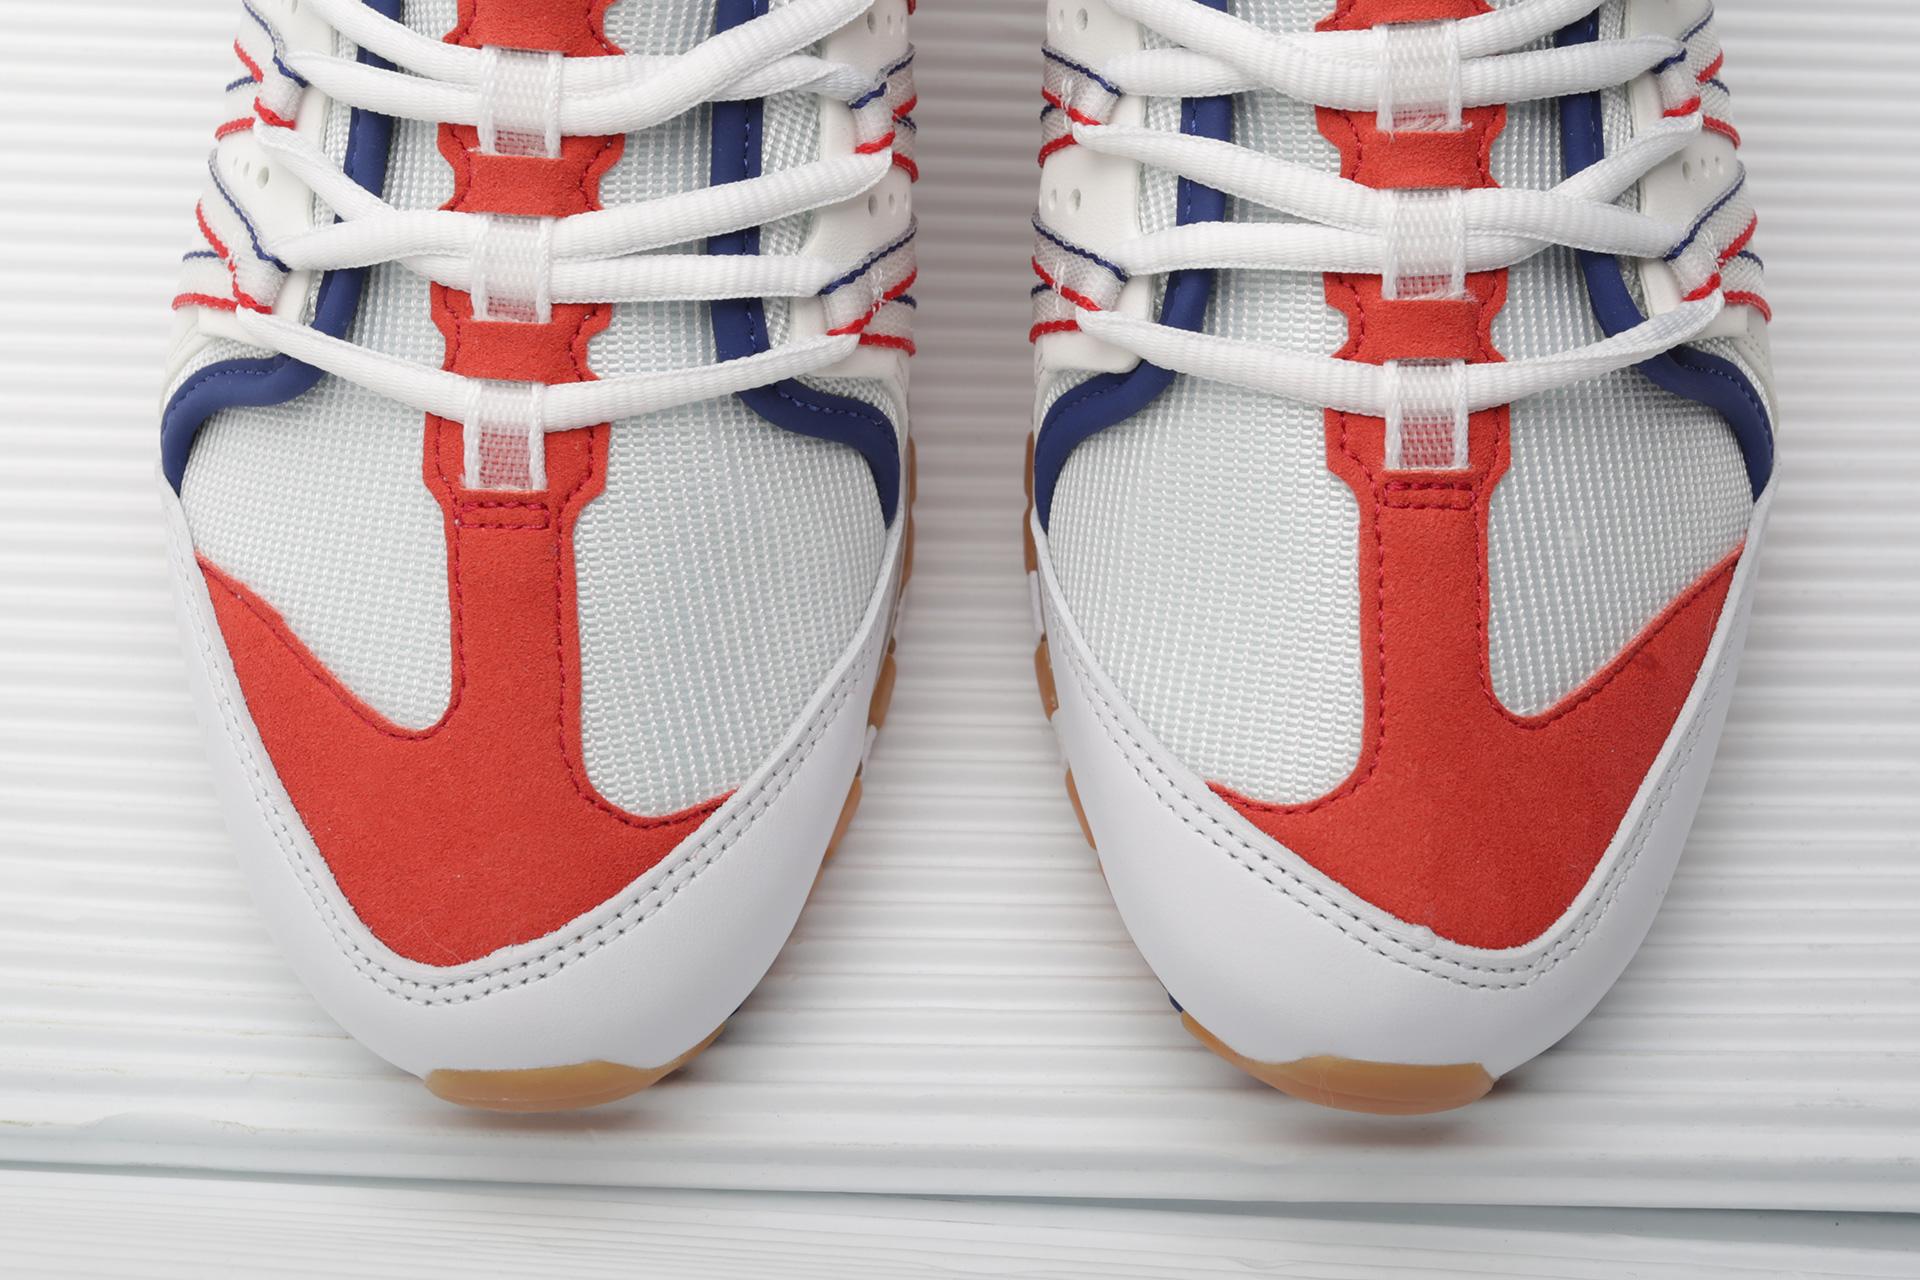 7457f081 ... Купить мужские белые кроссовки Nike Air Max 97 / Haven / Clot - фото 6  картинки